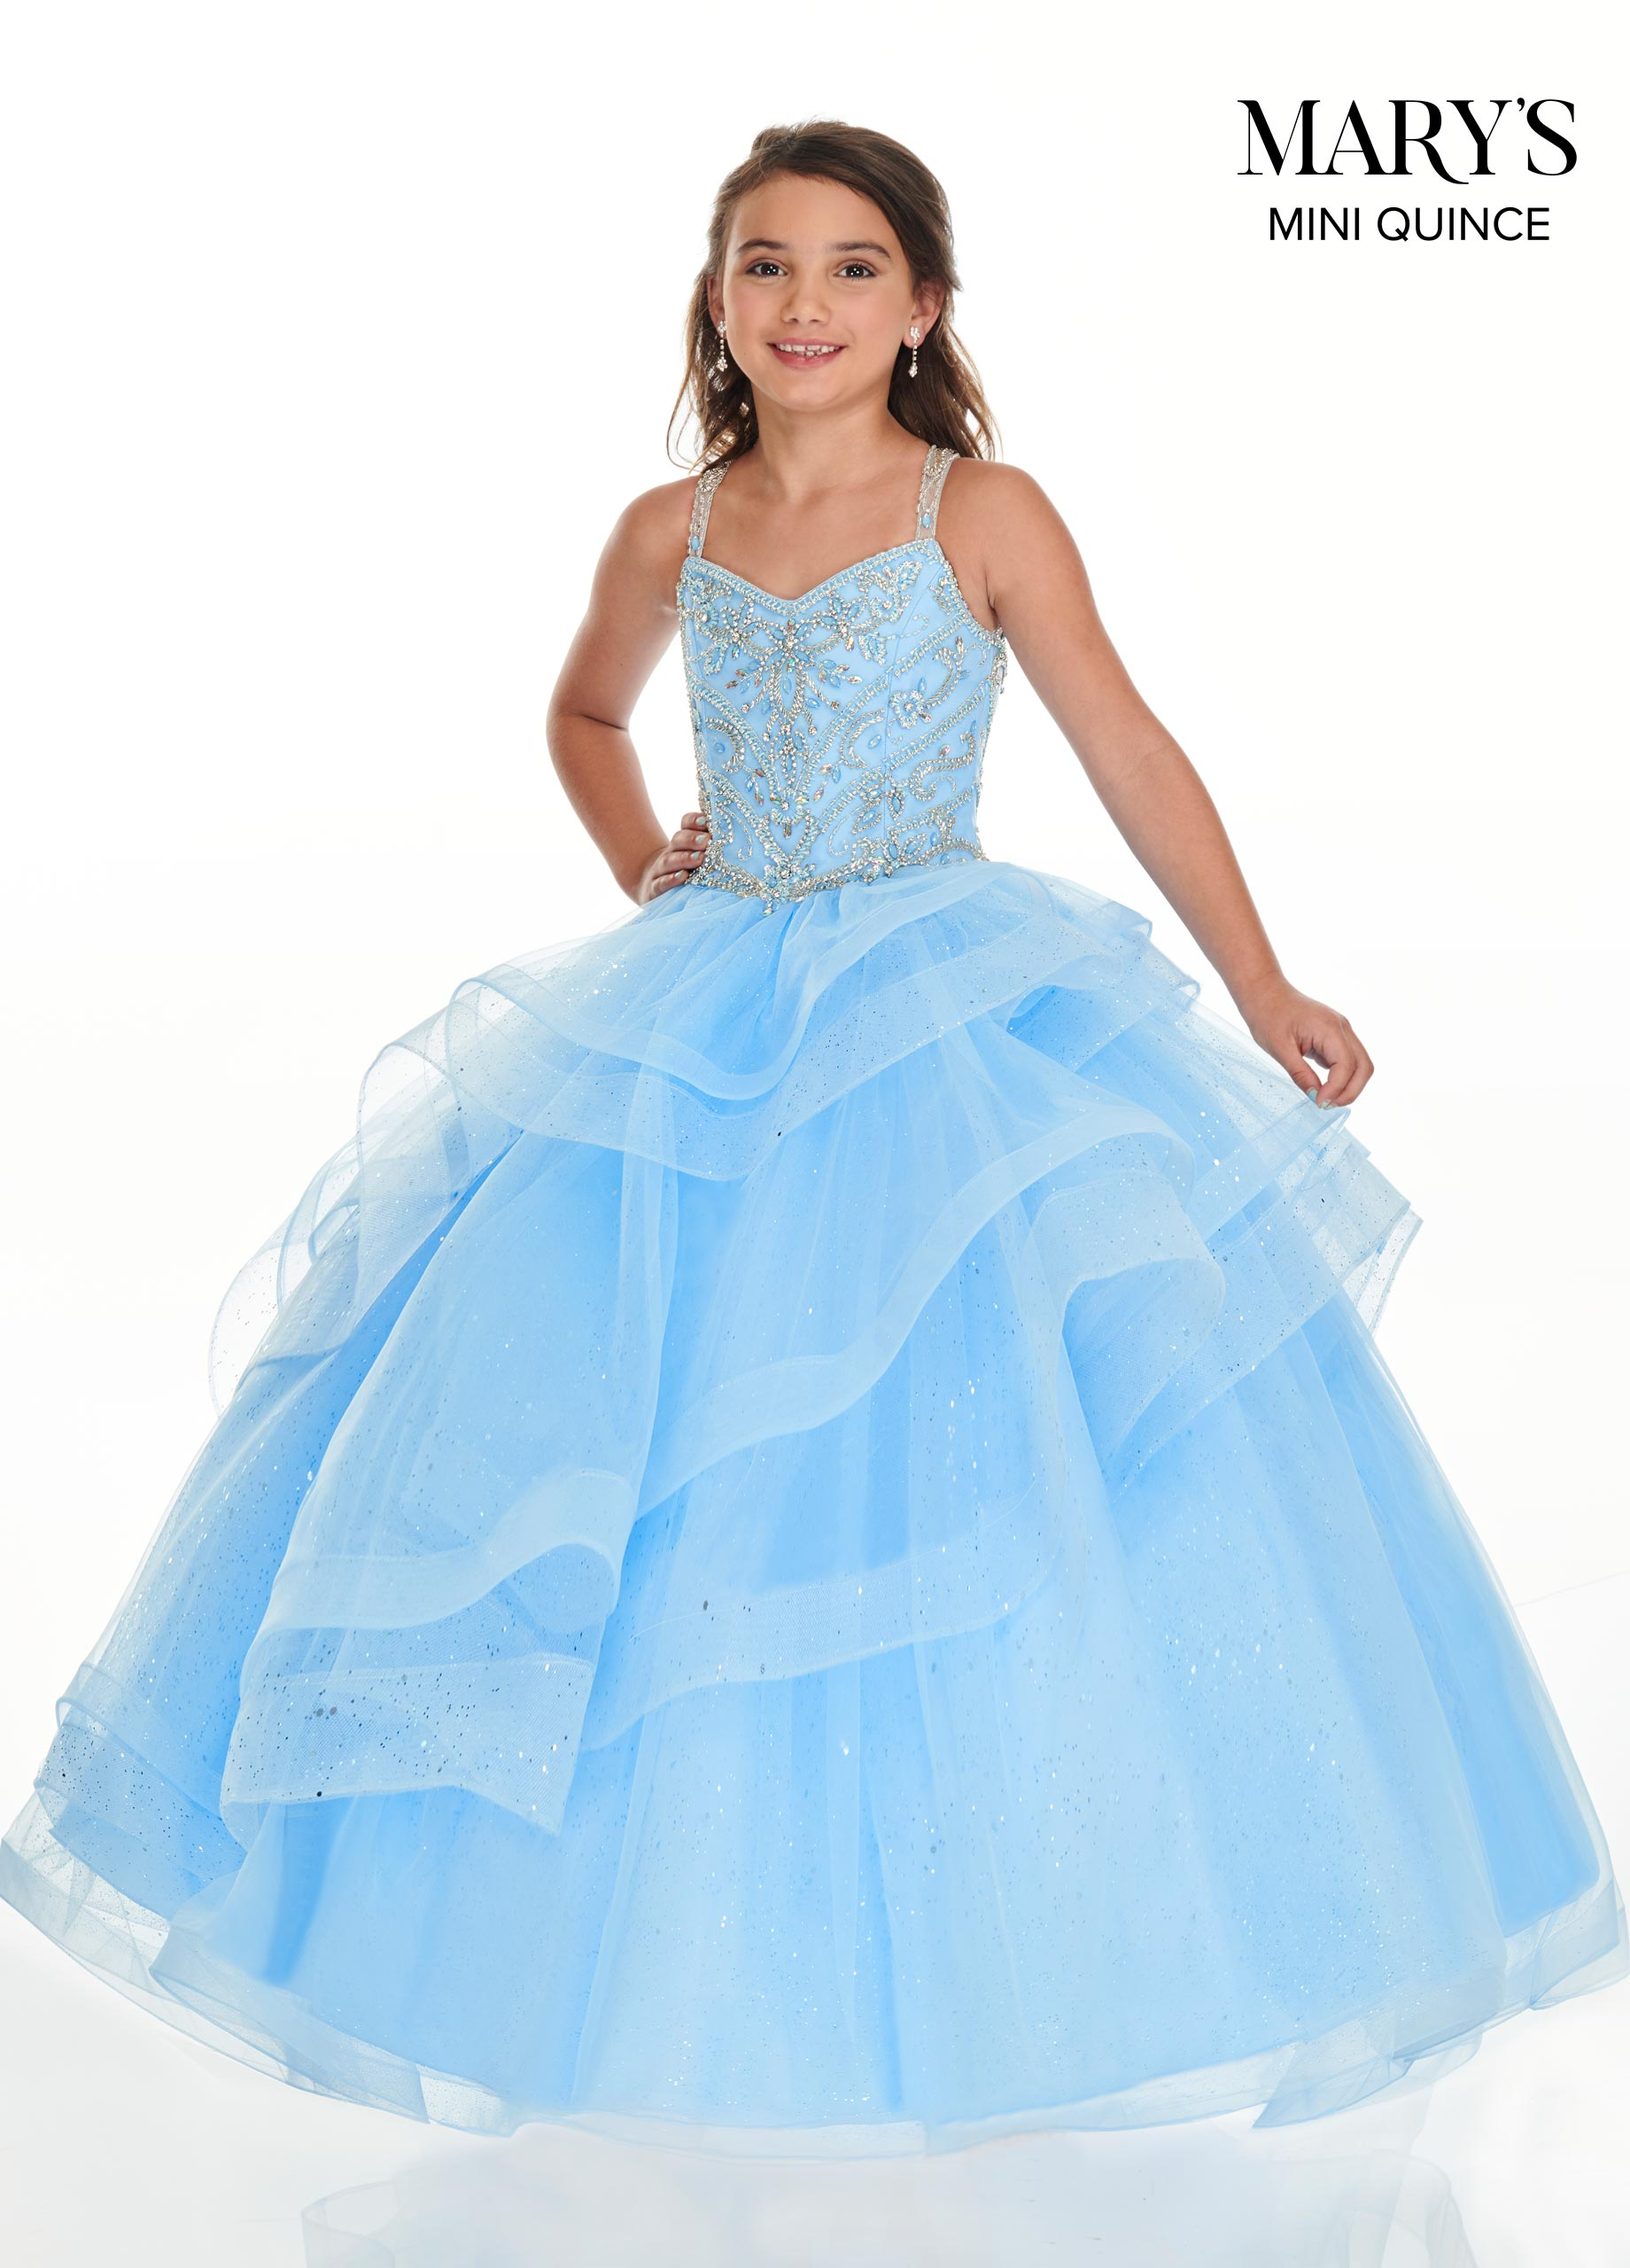 Little Quince Dresses | Mini Quince | Style - MQ4016